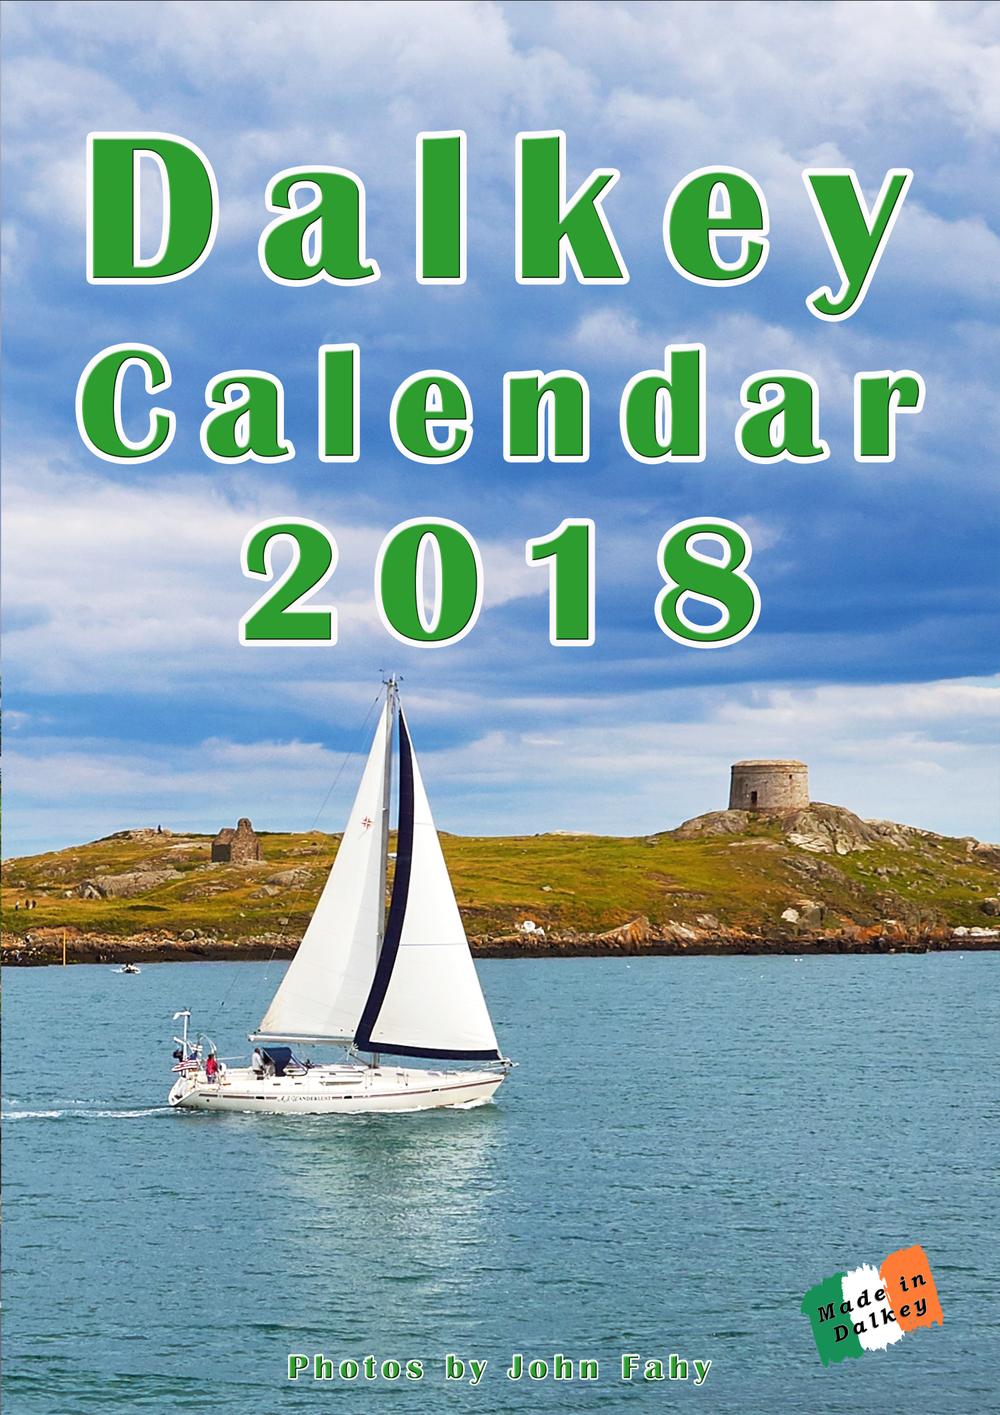 Dalkey Calendar 2018